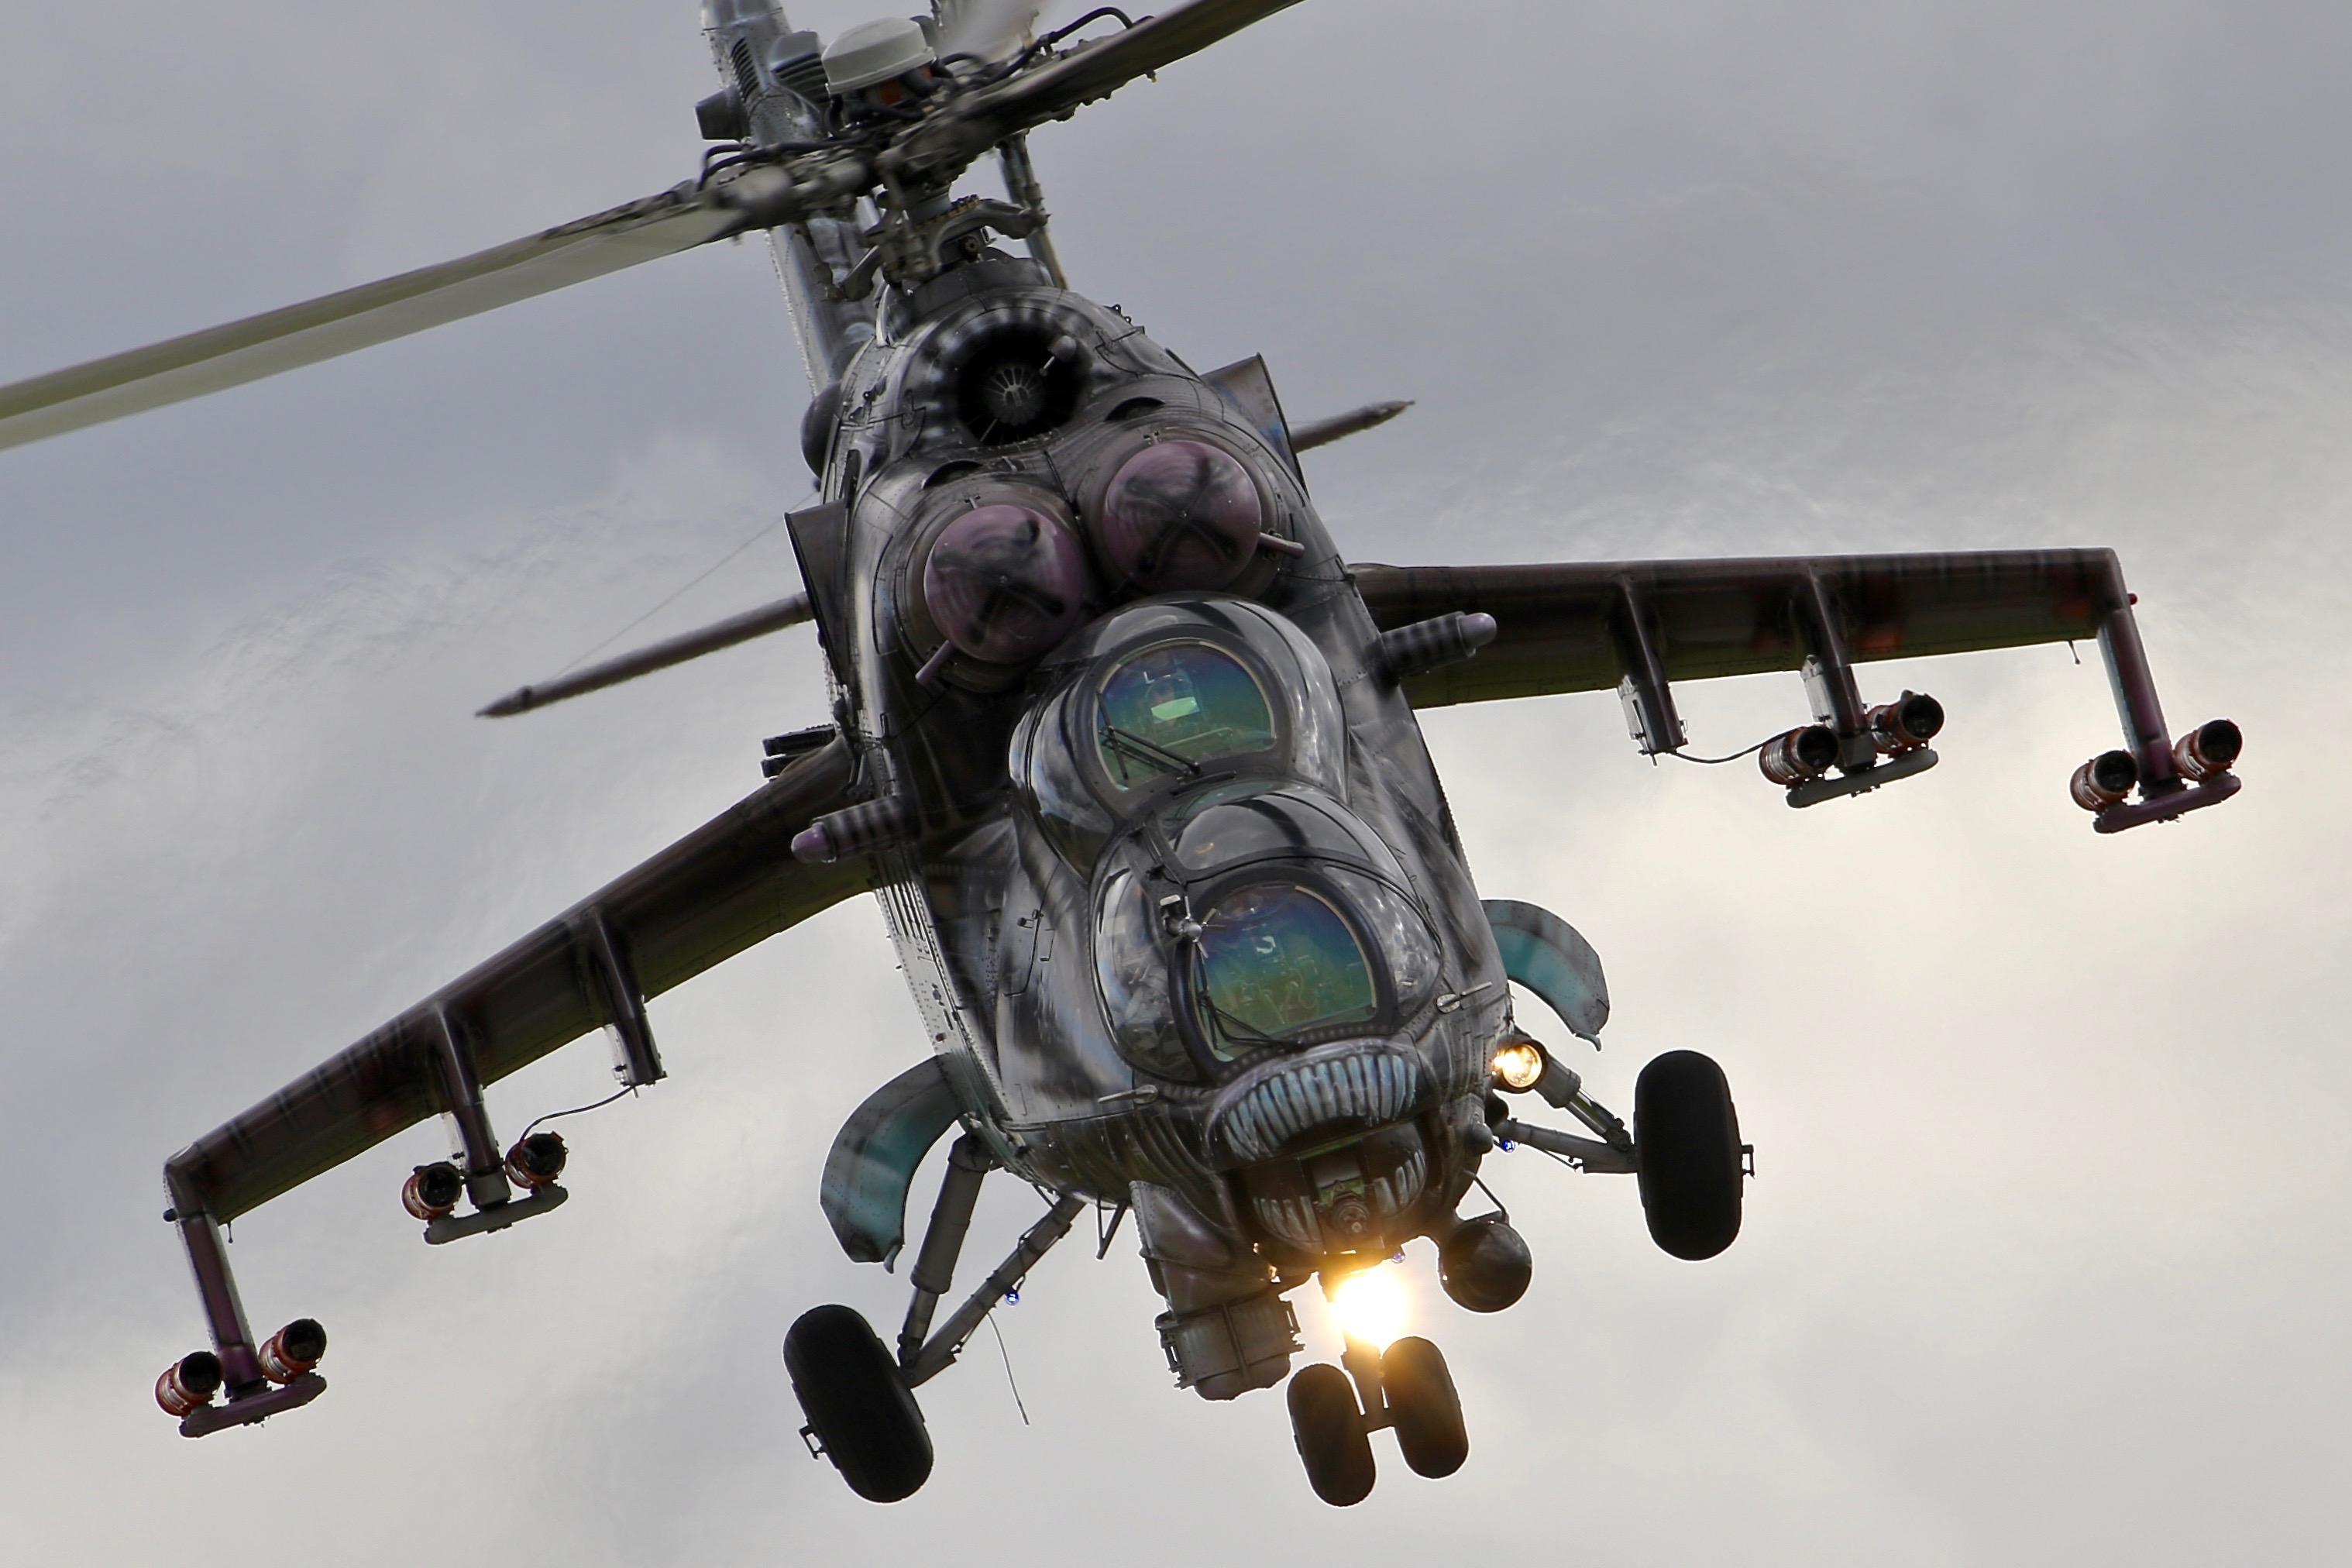 Mi-35 Hind in alien tiger markings